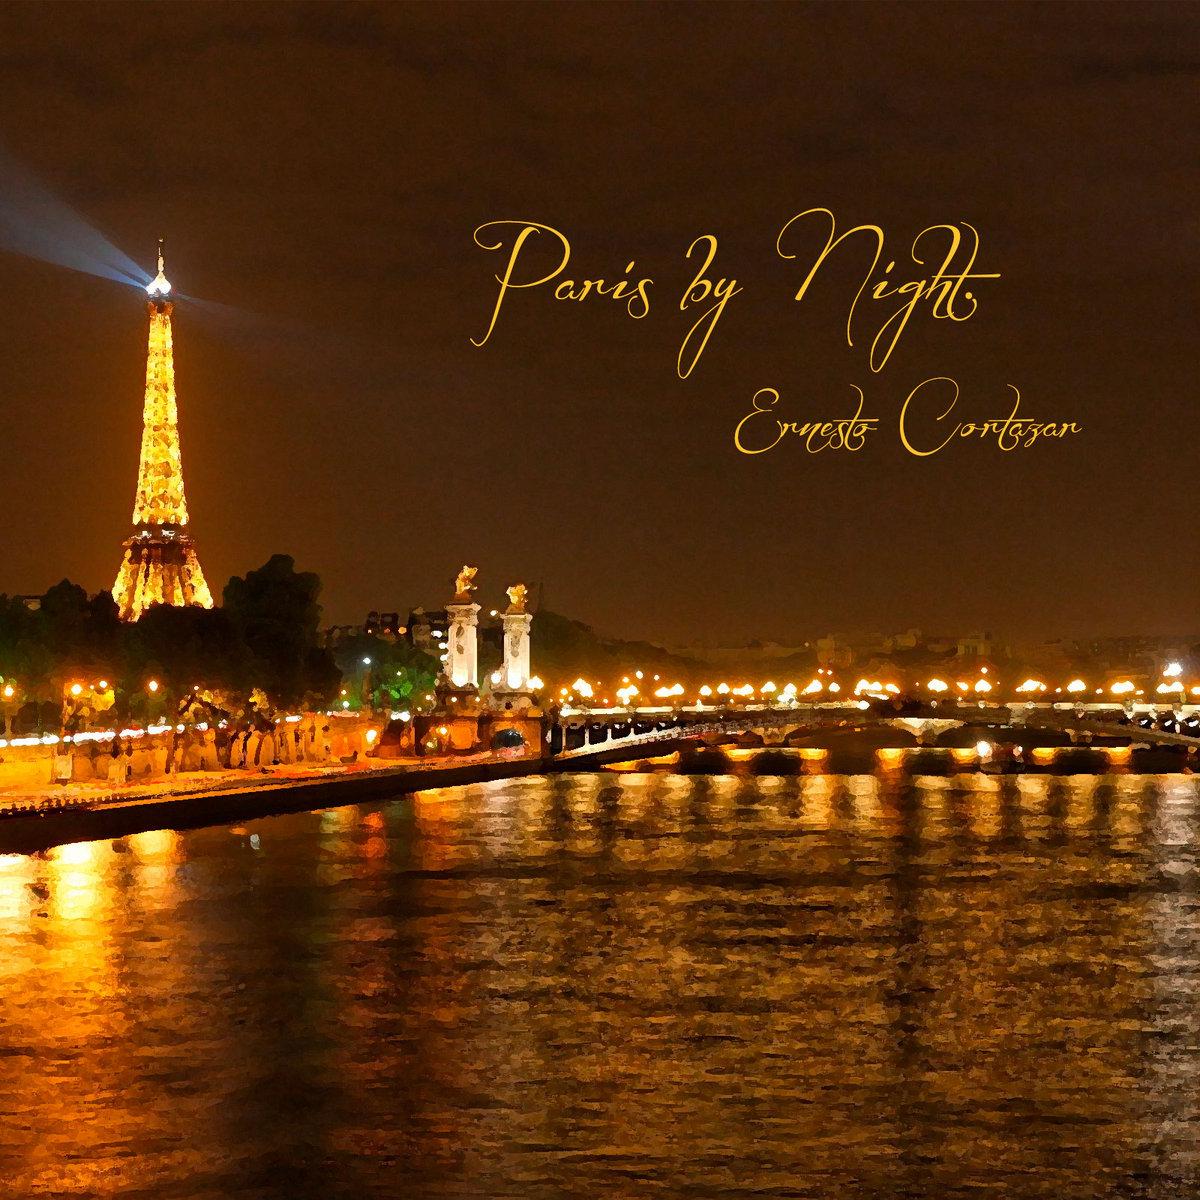 Paris by Night | Ernesto Cortazar - Relaxing Piano Music